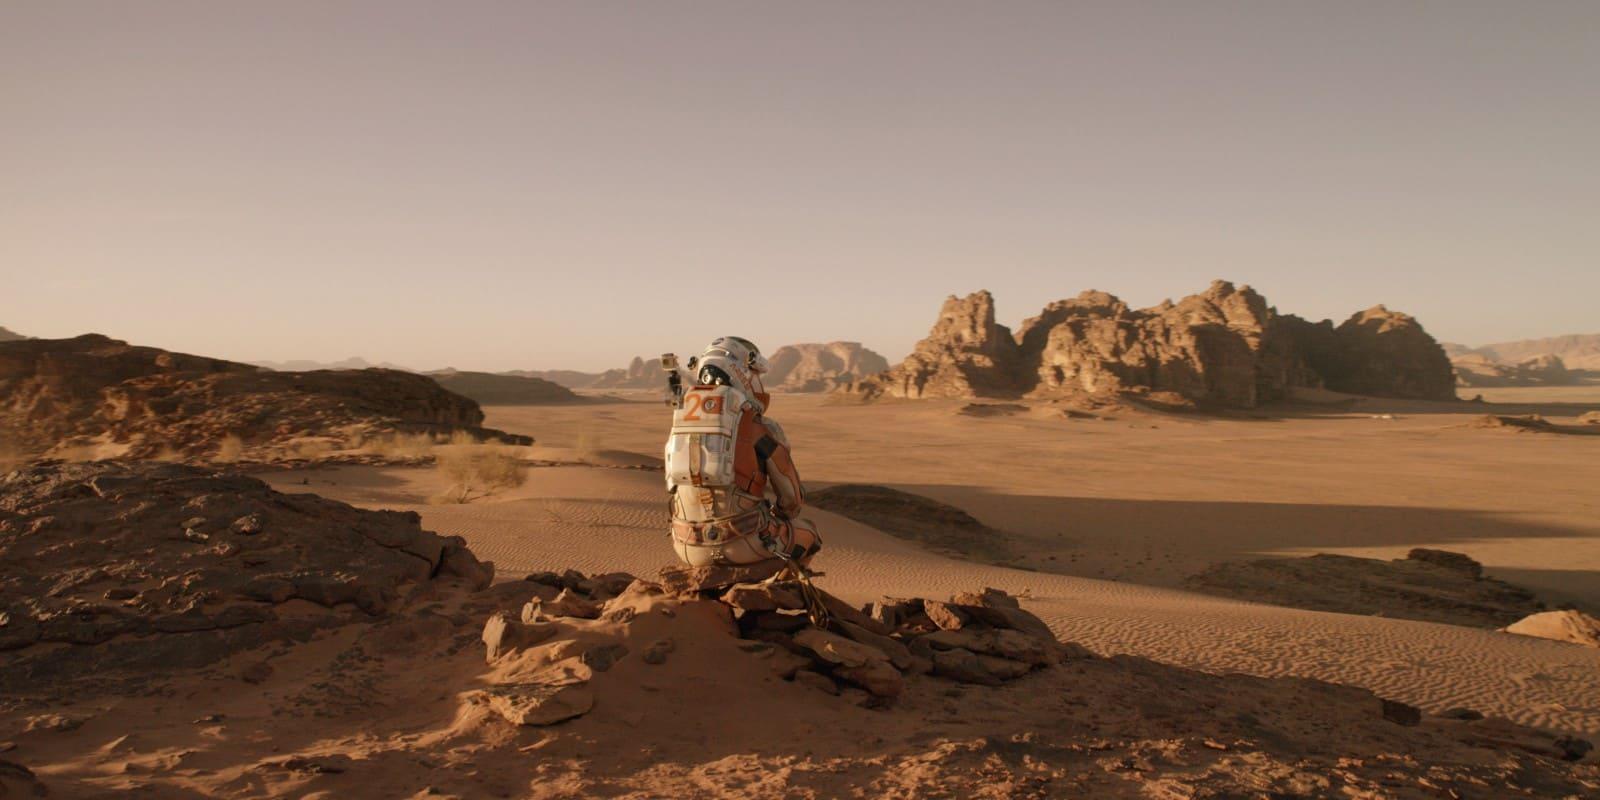 Wide Angle Shot - Camera Movements and Angles- The Martian